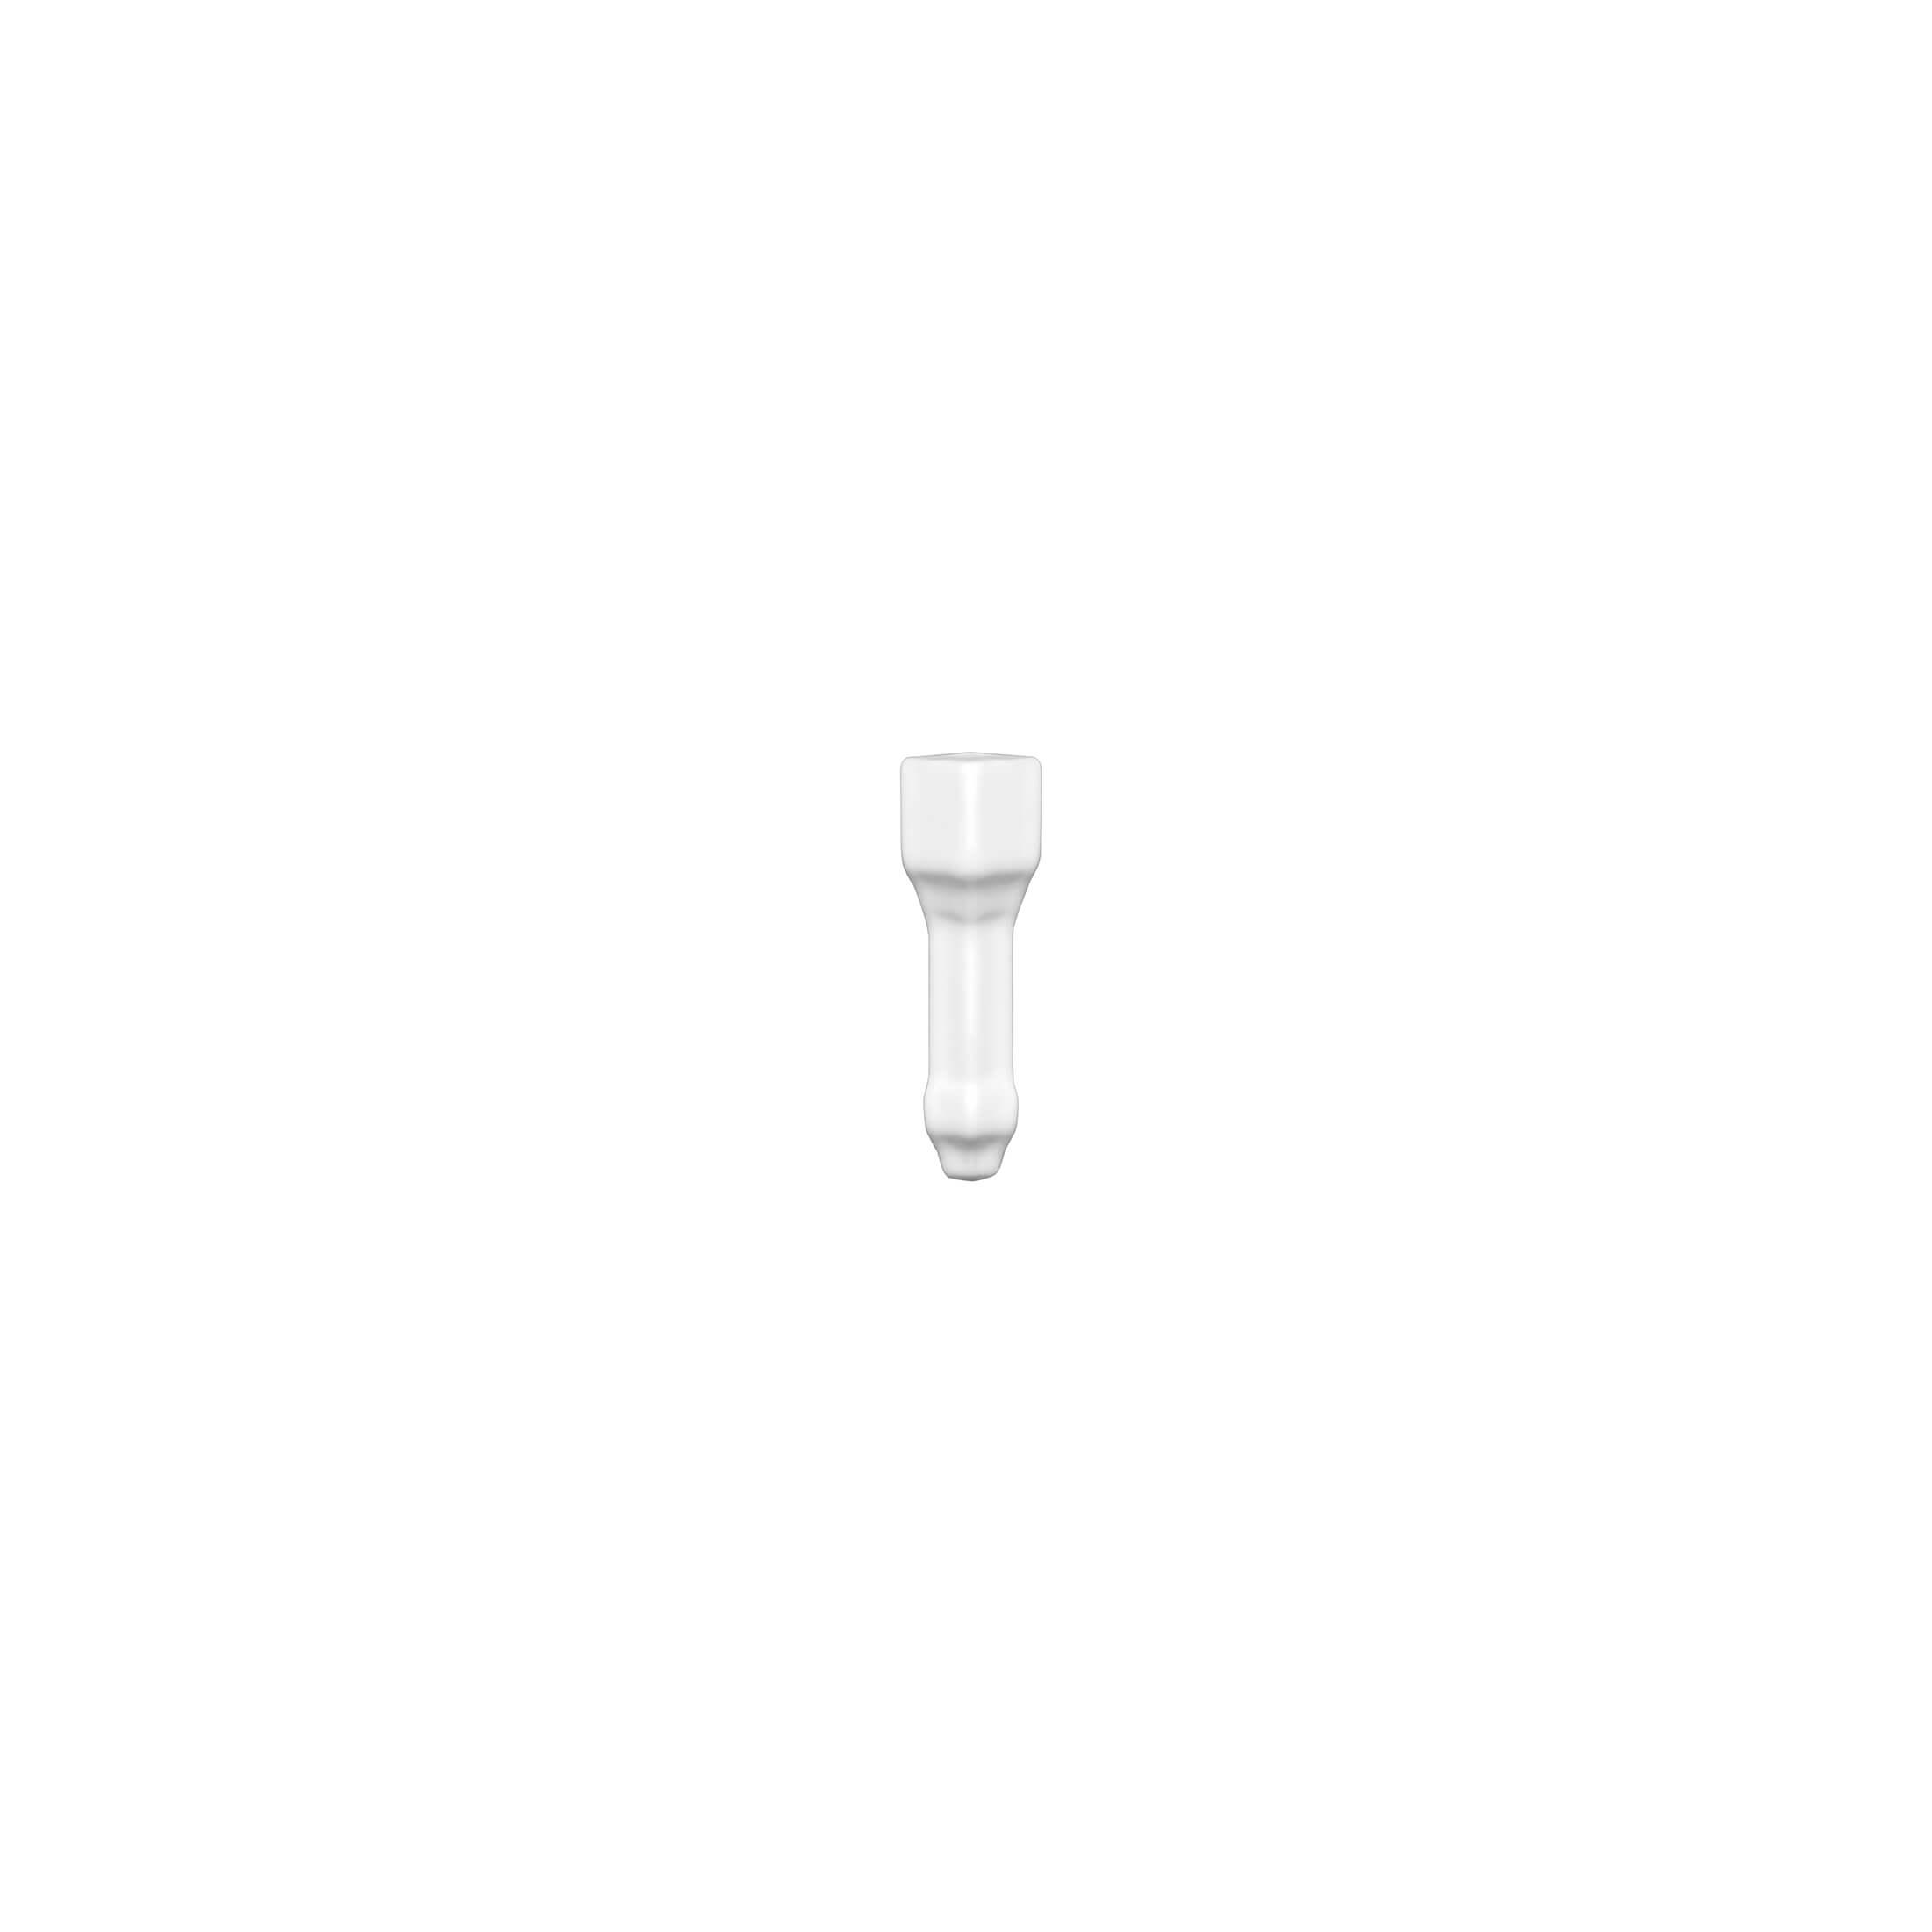 ADNE5368 - ANGULO EXTERIOR CORNISACLASICA - 7.5 cm X 15 cm